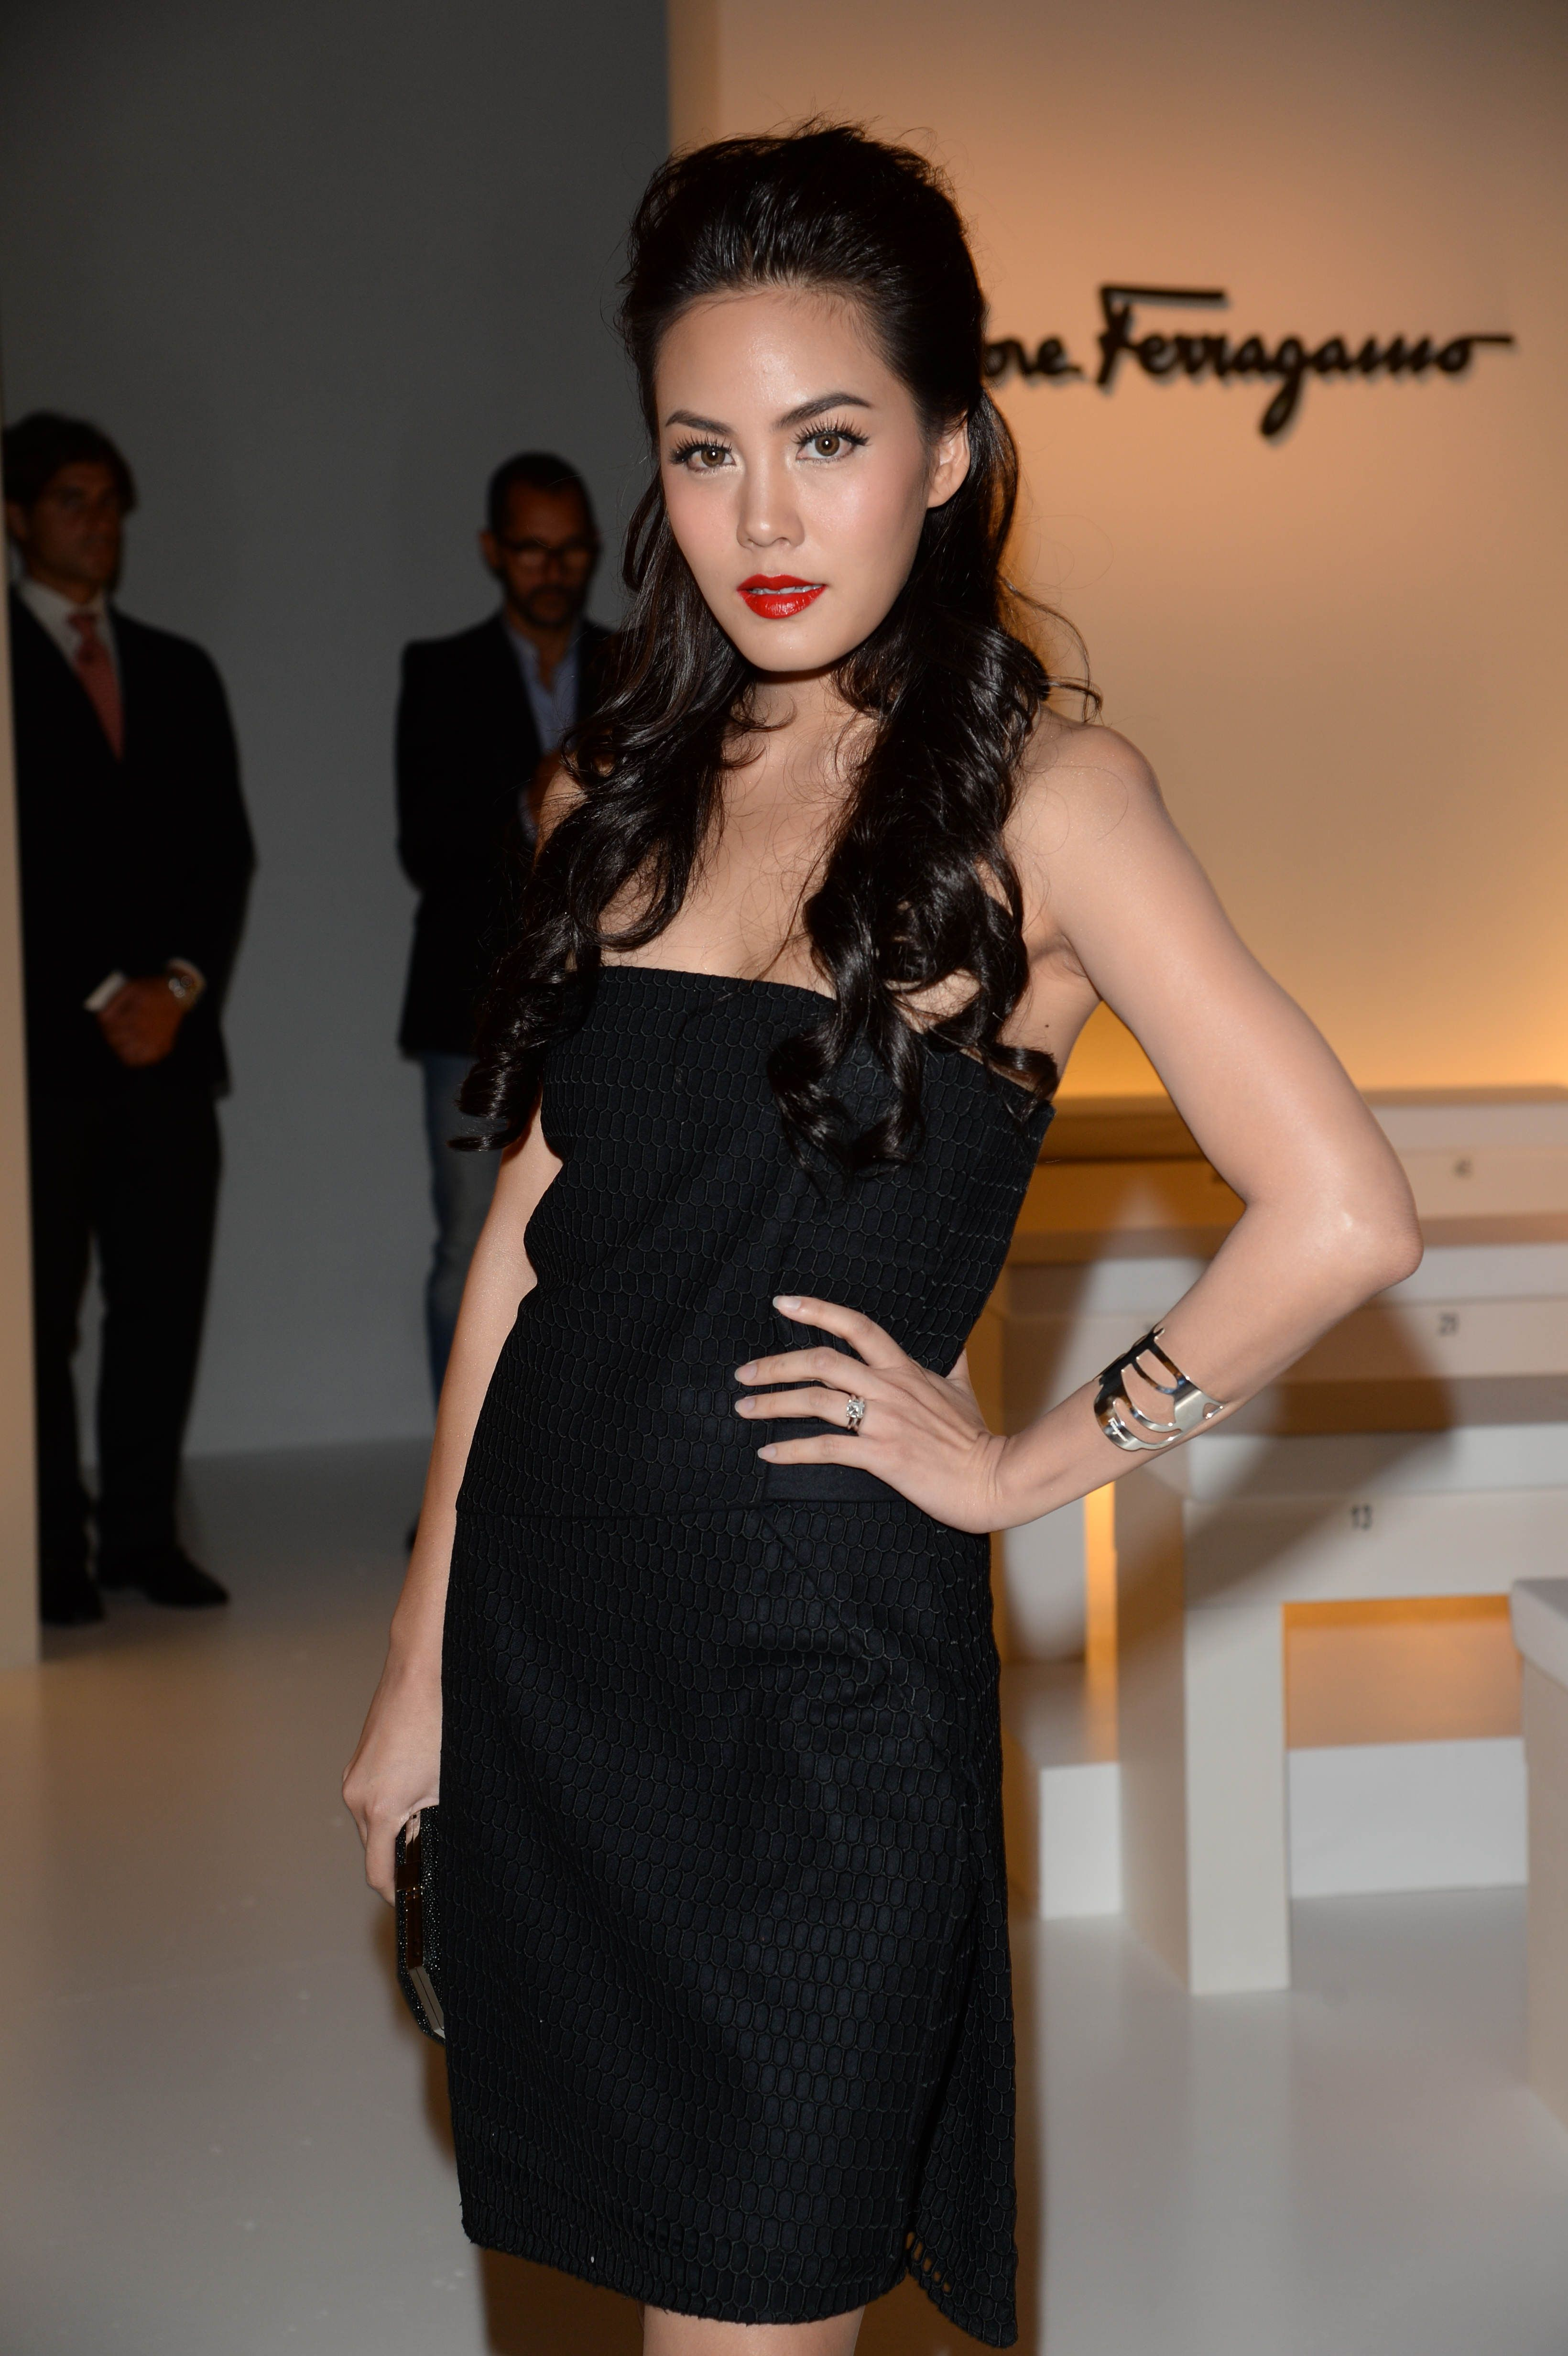 Janie Tienphosuwan naked (55 foto and video), Pussy, Hot, Selfie, legs 2018